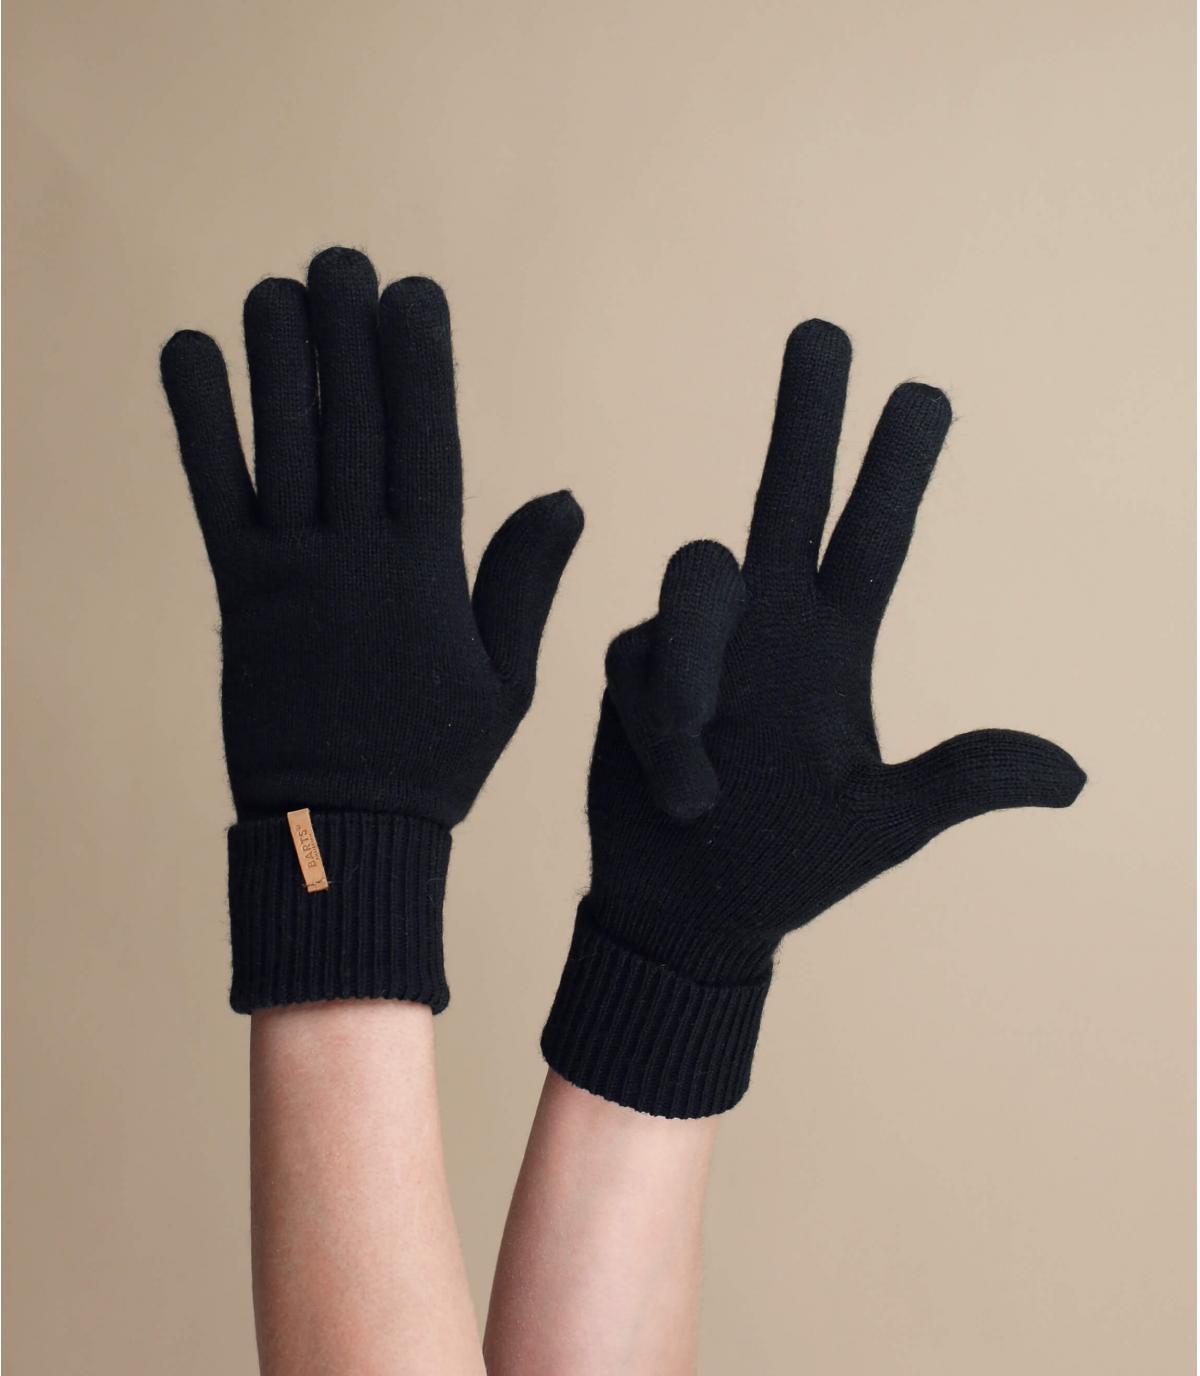 Thin black gloves